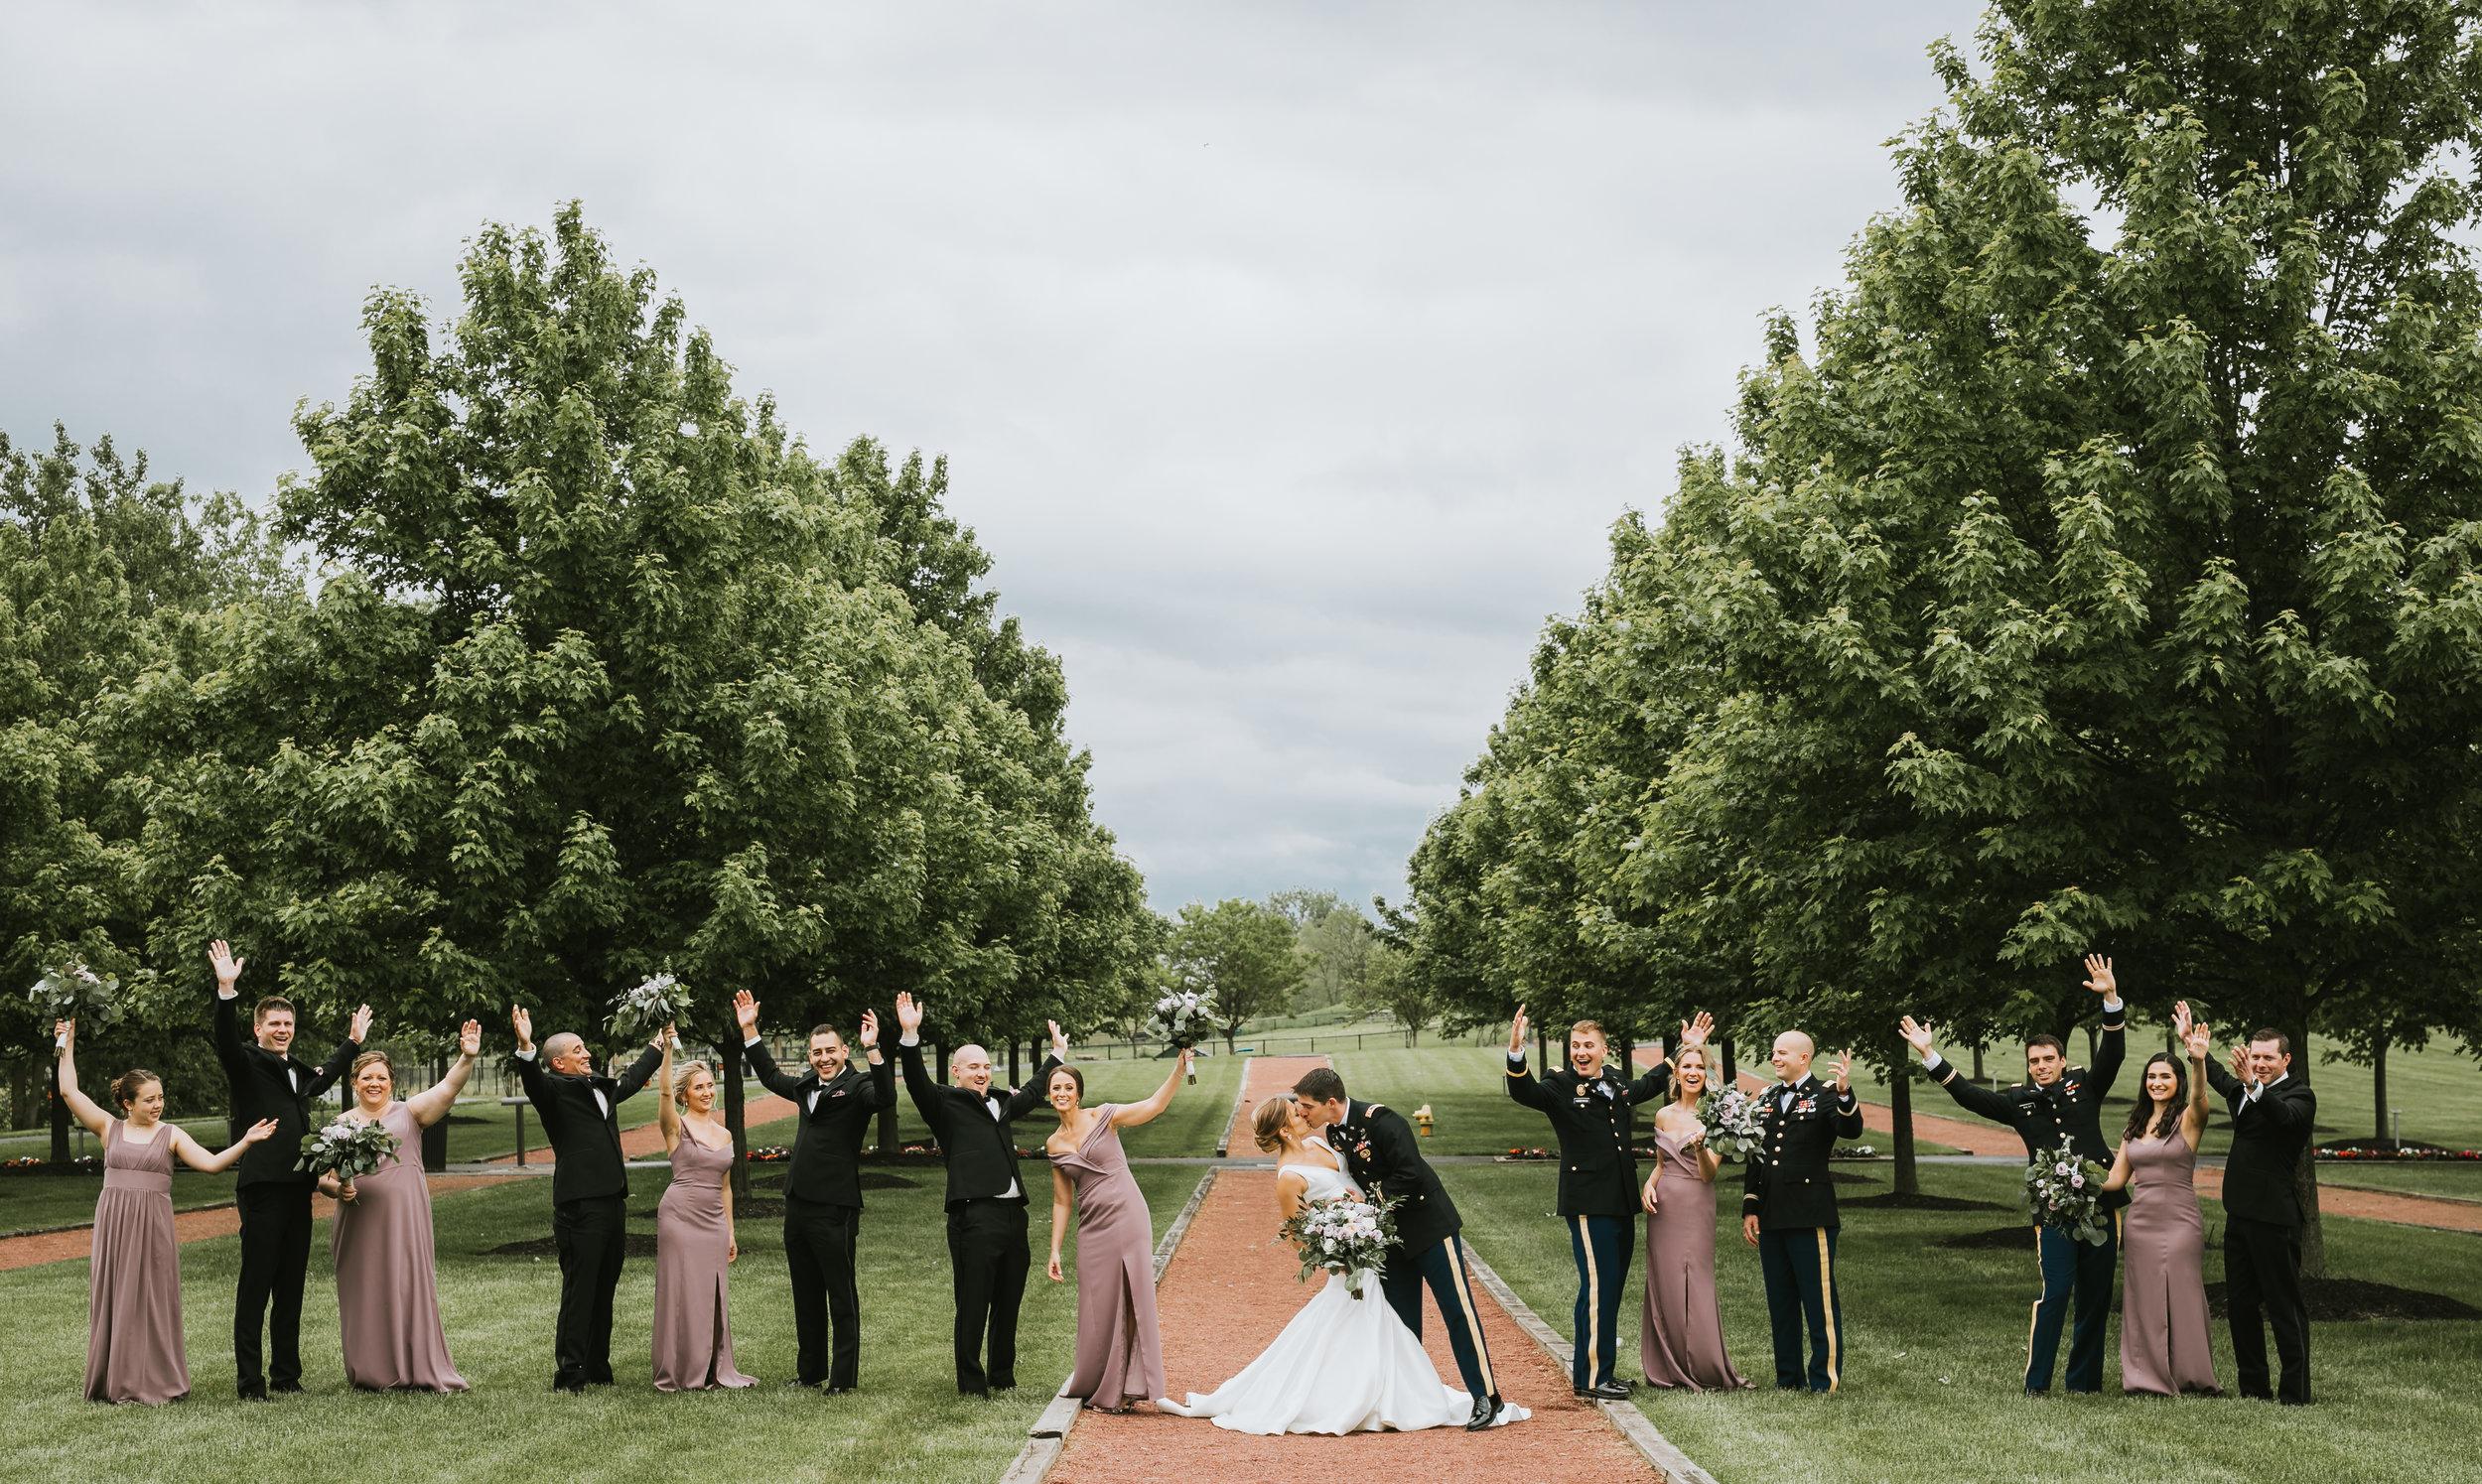 bridal-party-poses-indiana-wedding.jpg